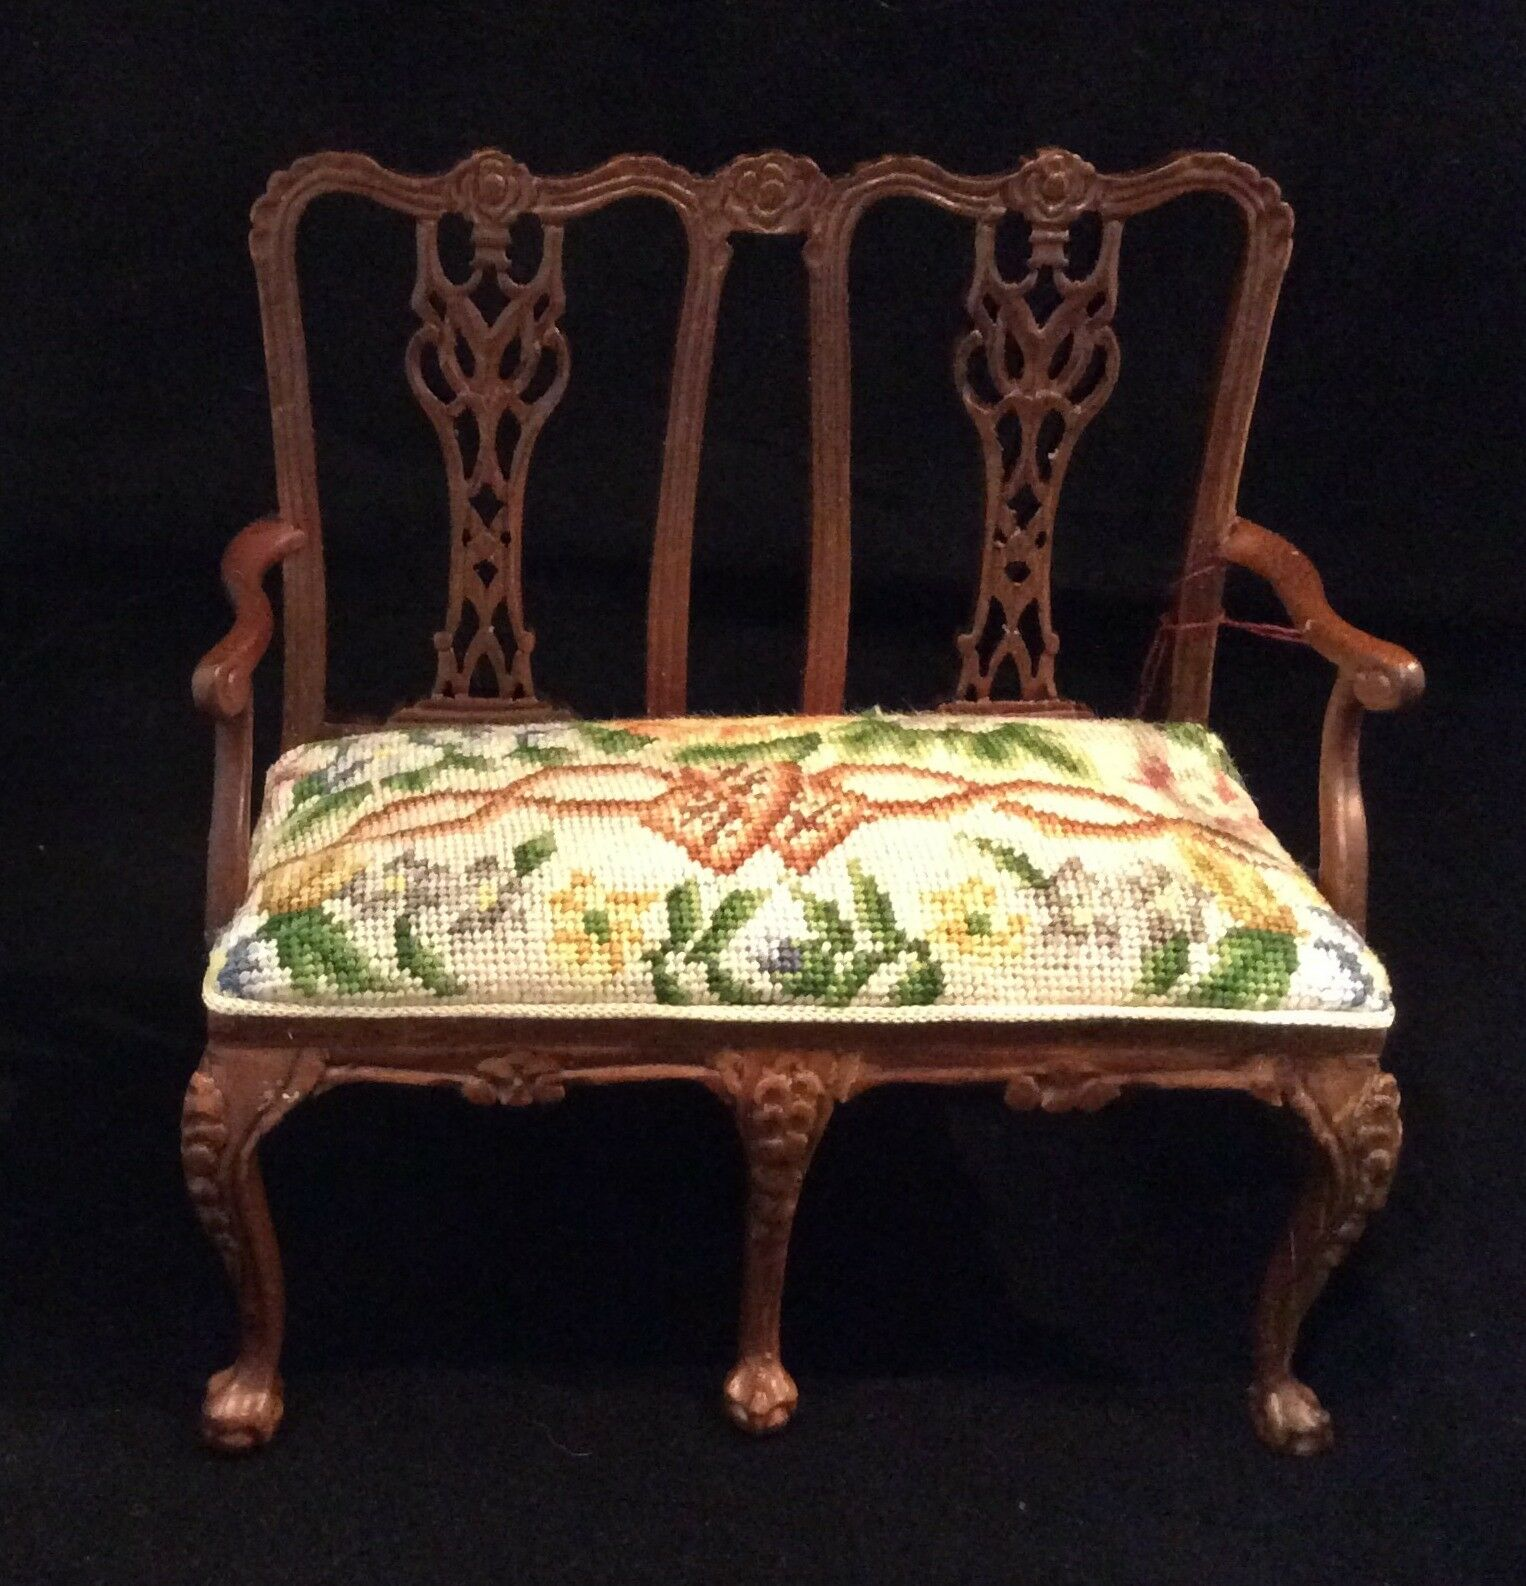 JBM Miniature Dollhouse settee with antique petit point - needlepoint.